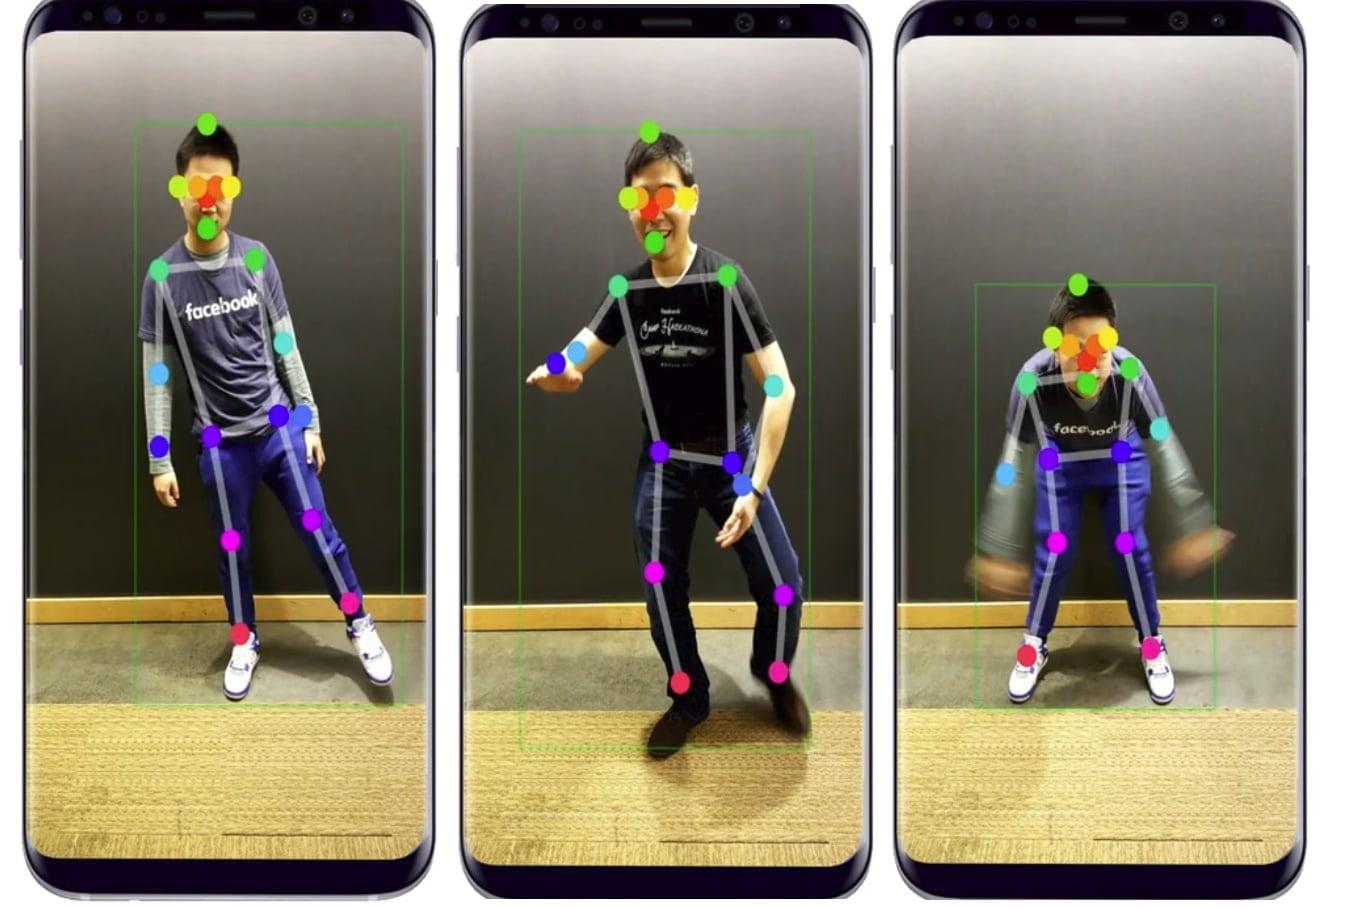 Facebook's Next Assault on Snapchat – Full-Body AR